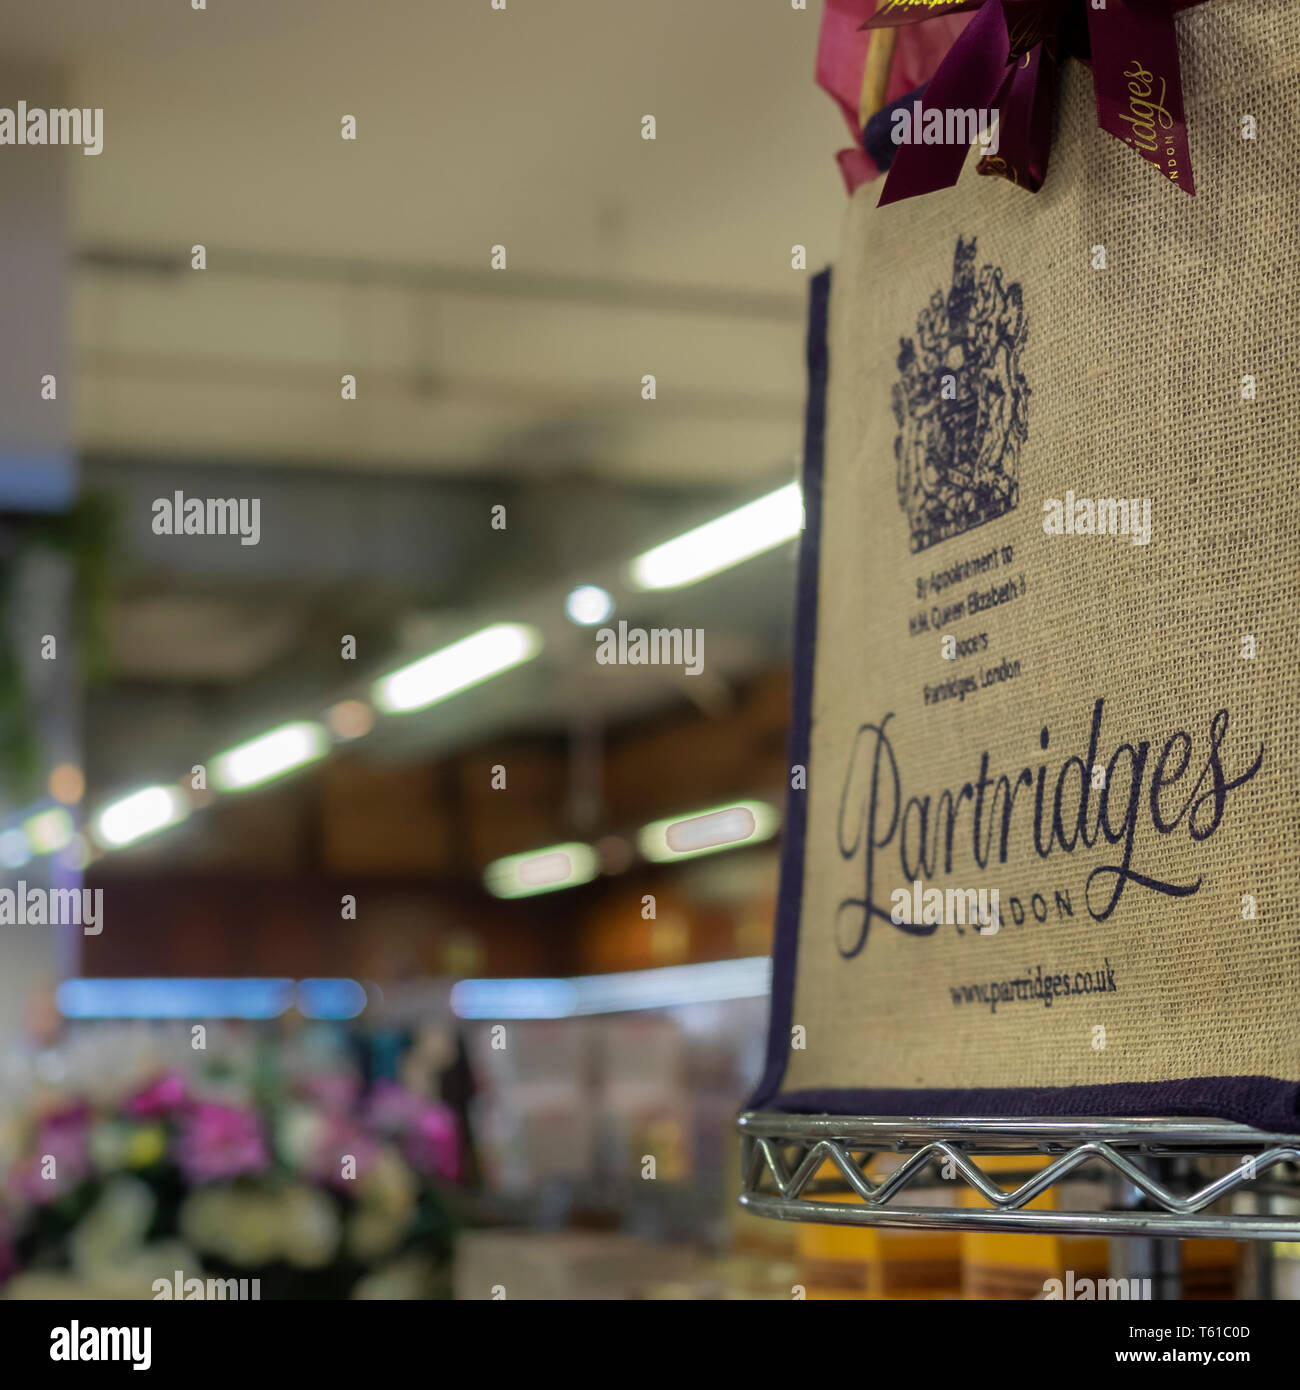 DUKE OF YORK SQUARE, LONDON: Advertising bag at Partridges Shop - Stock Image